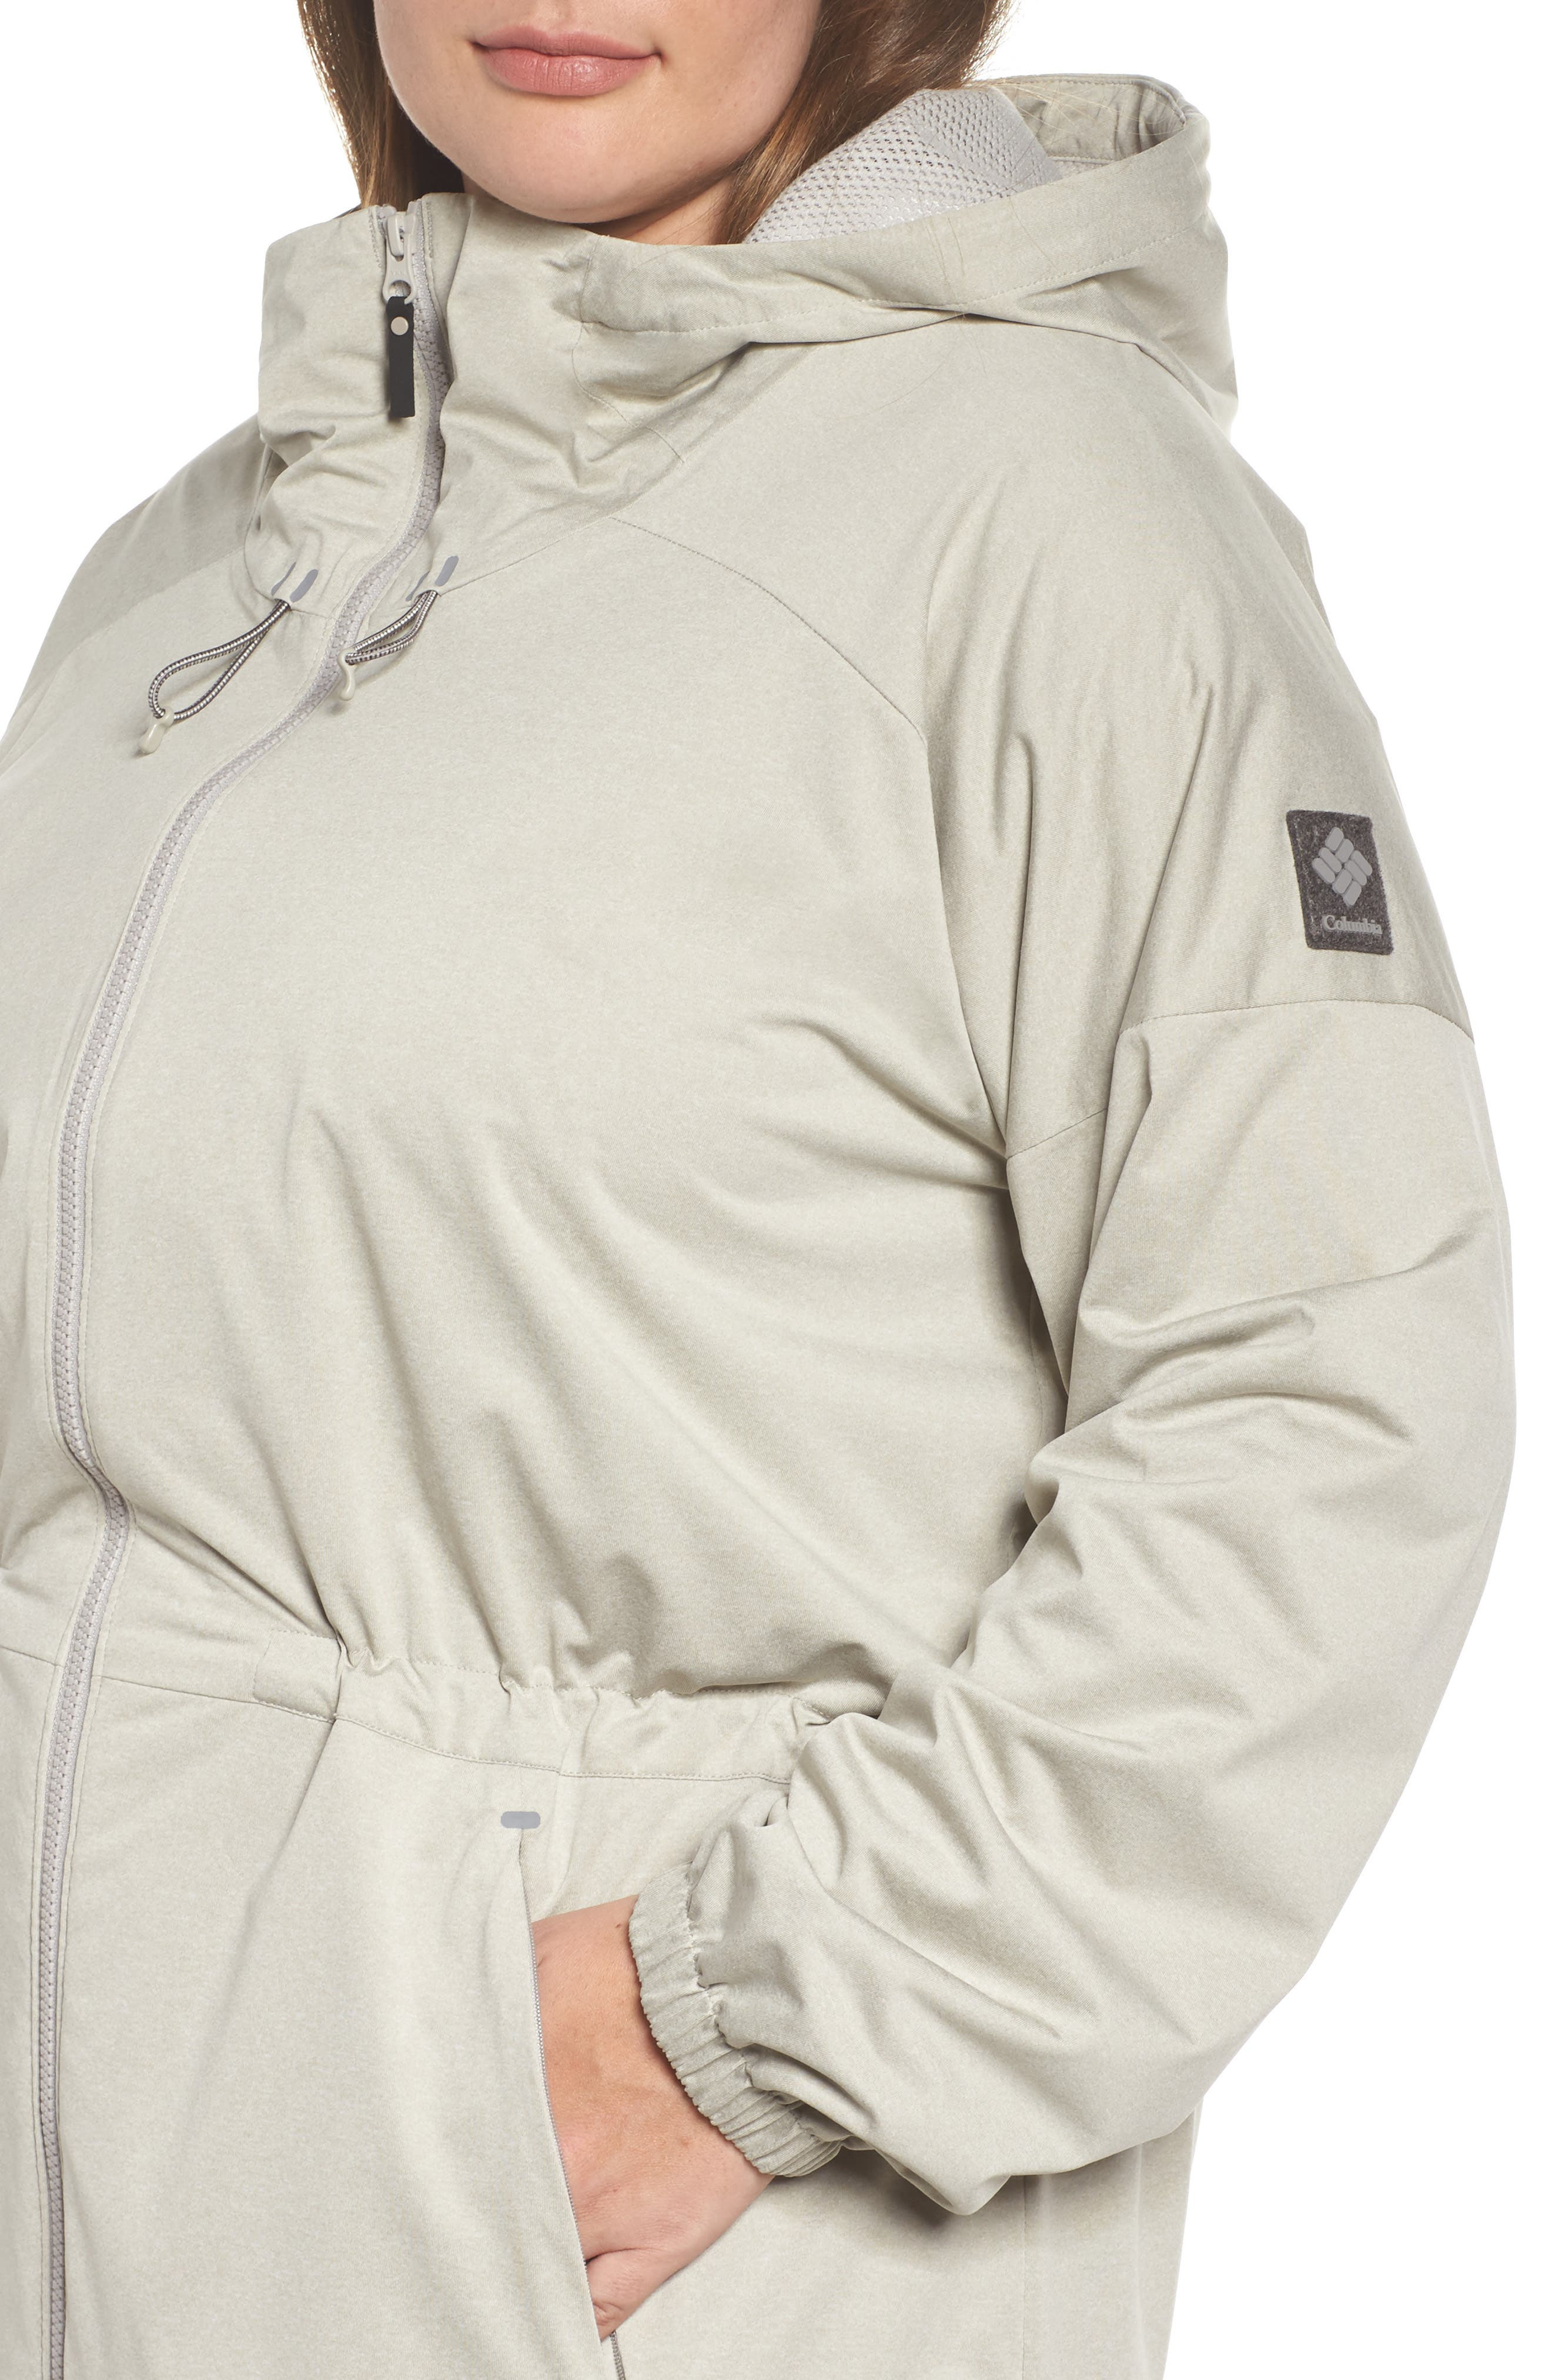 Northbounder Waterproof Hooded Jacket,                             Alternate thumbnail 4, color,